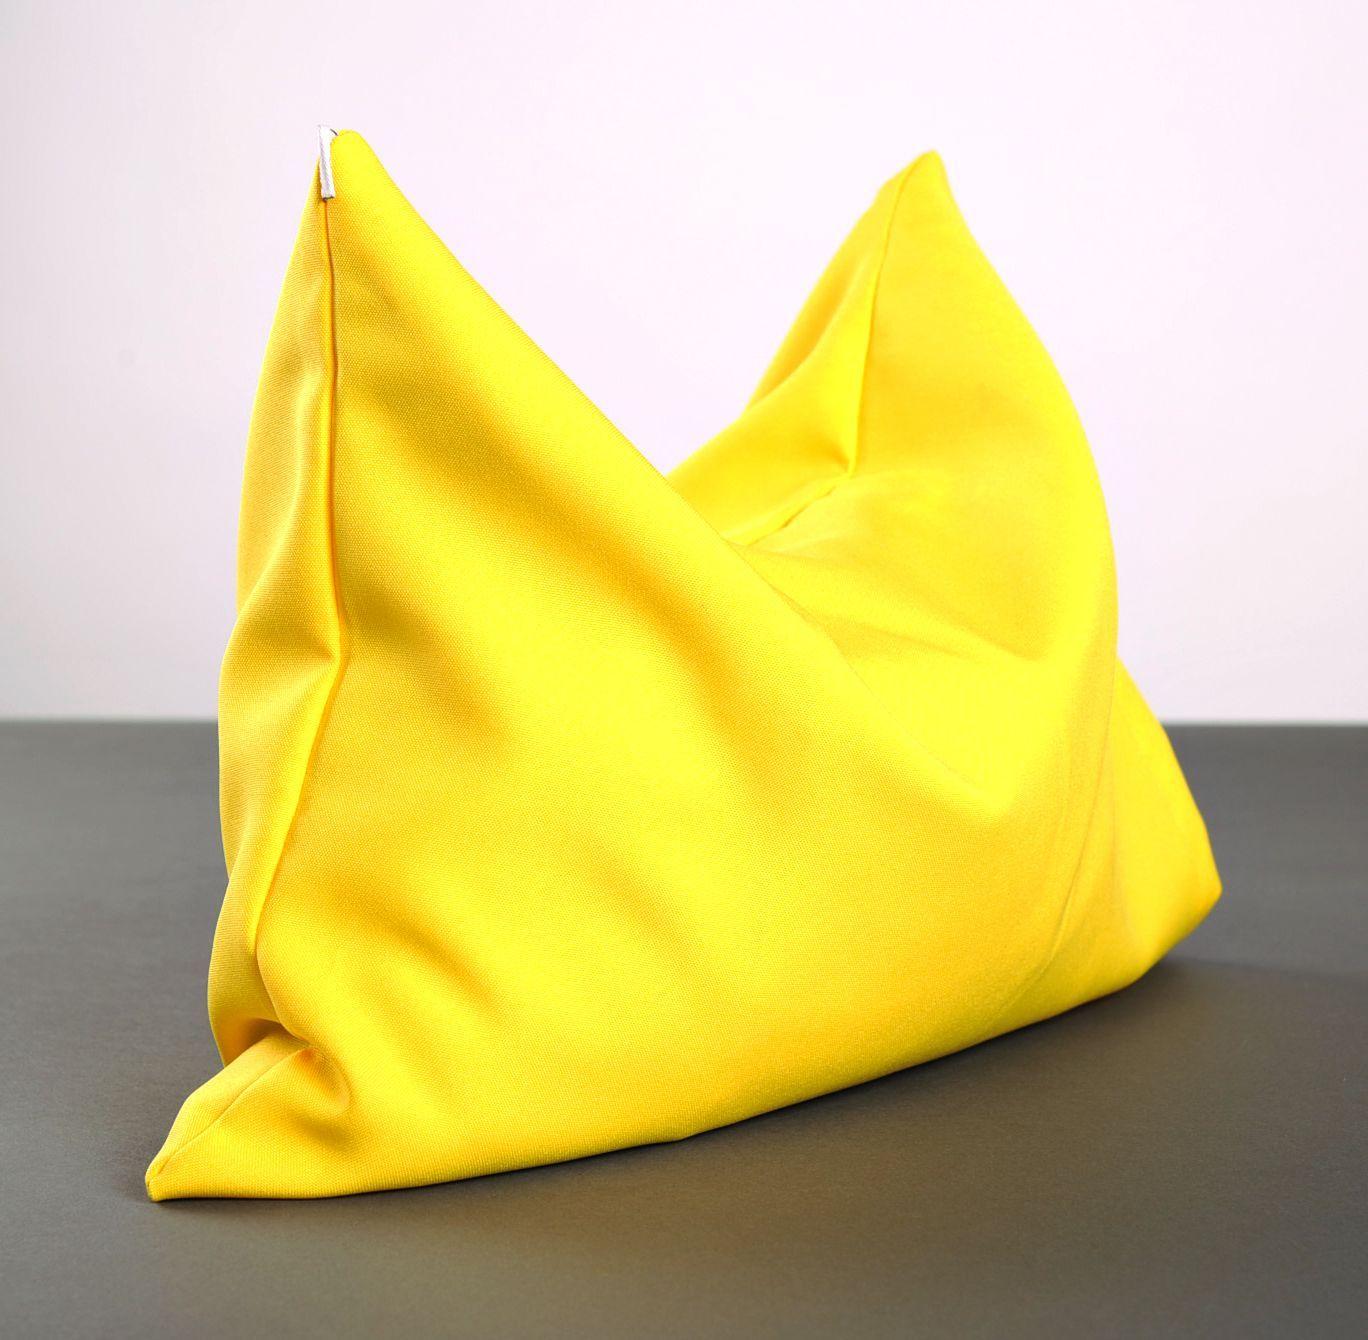 Yellow pillow for yoga photo 5